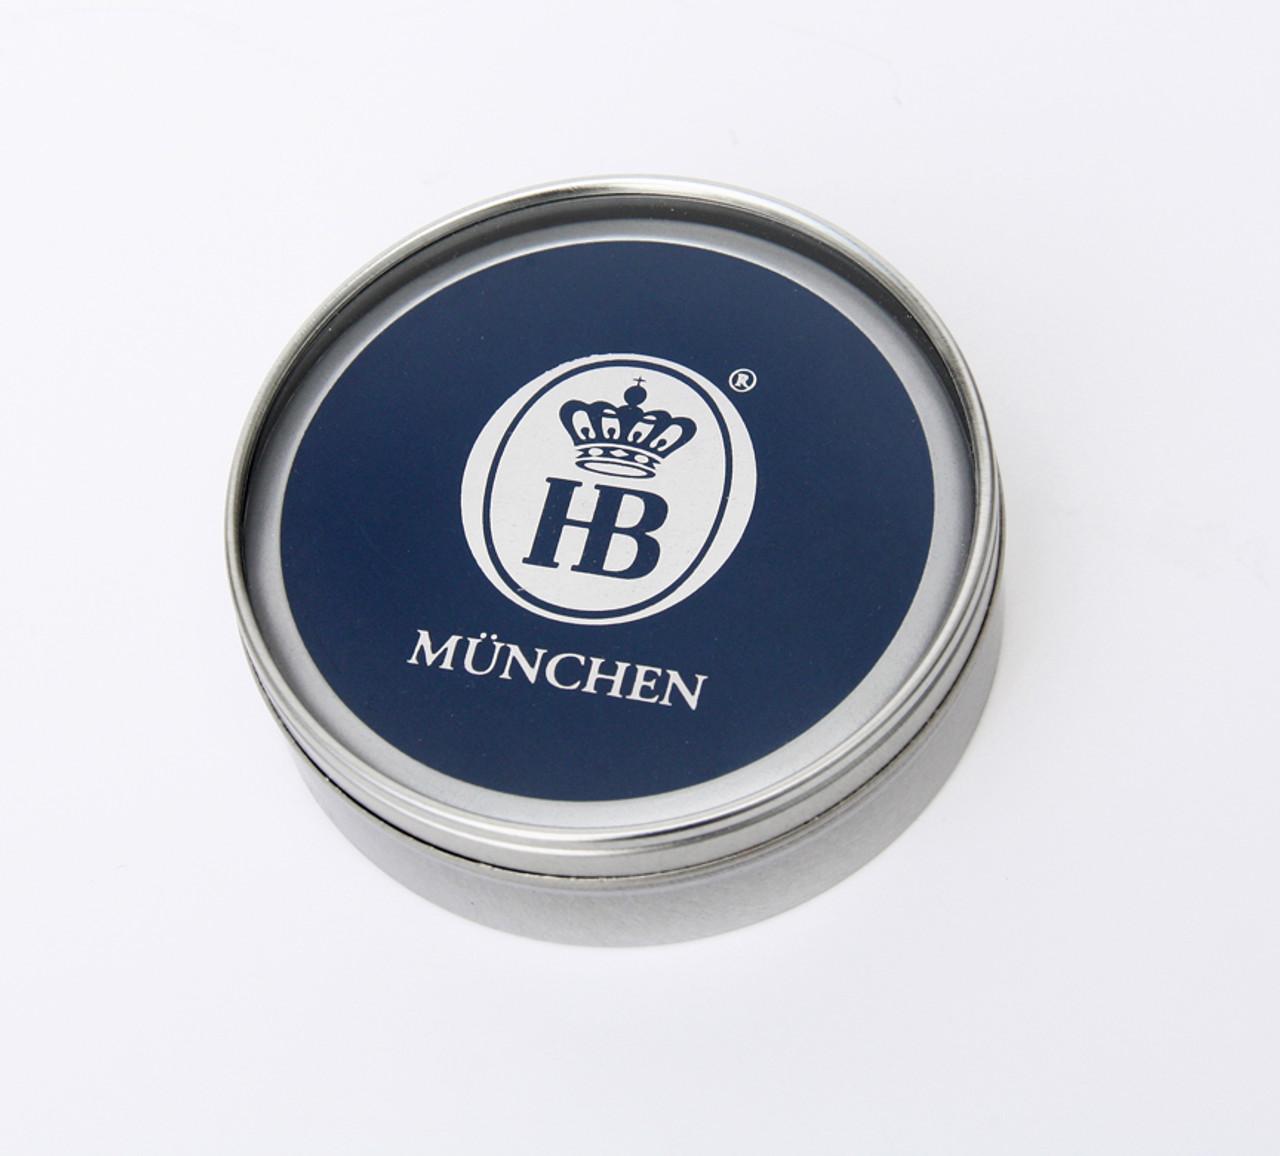 Hofbrauhaus Munich Brewery Beer Coasters Set of 6